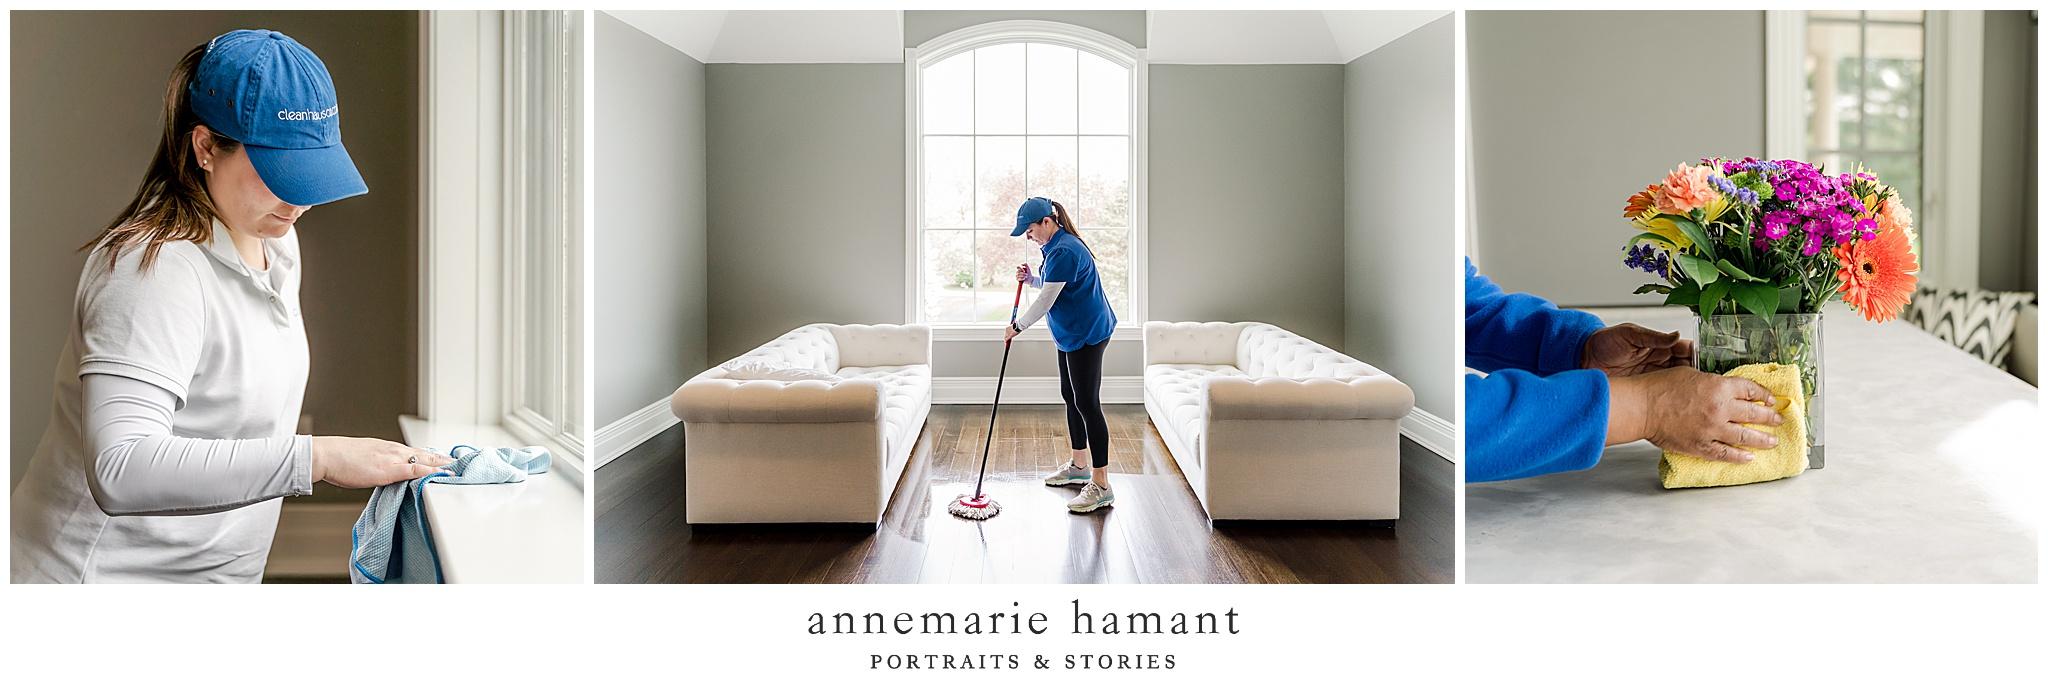 AnneMarie_Hamant_personal_brand_photographer_0138.jpg